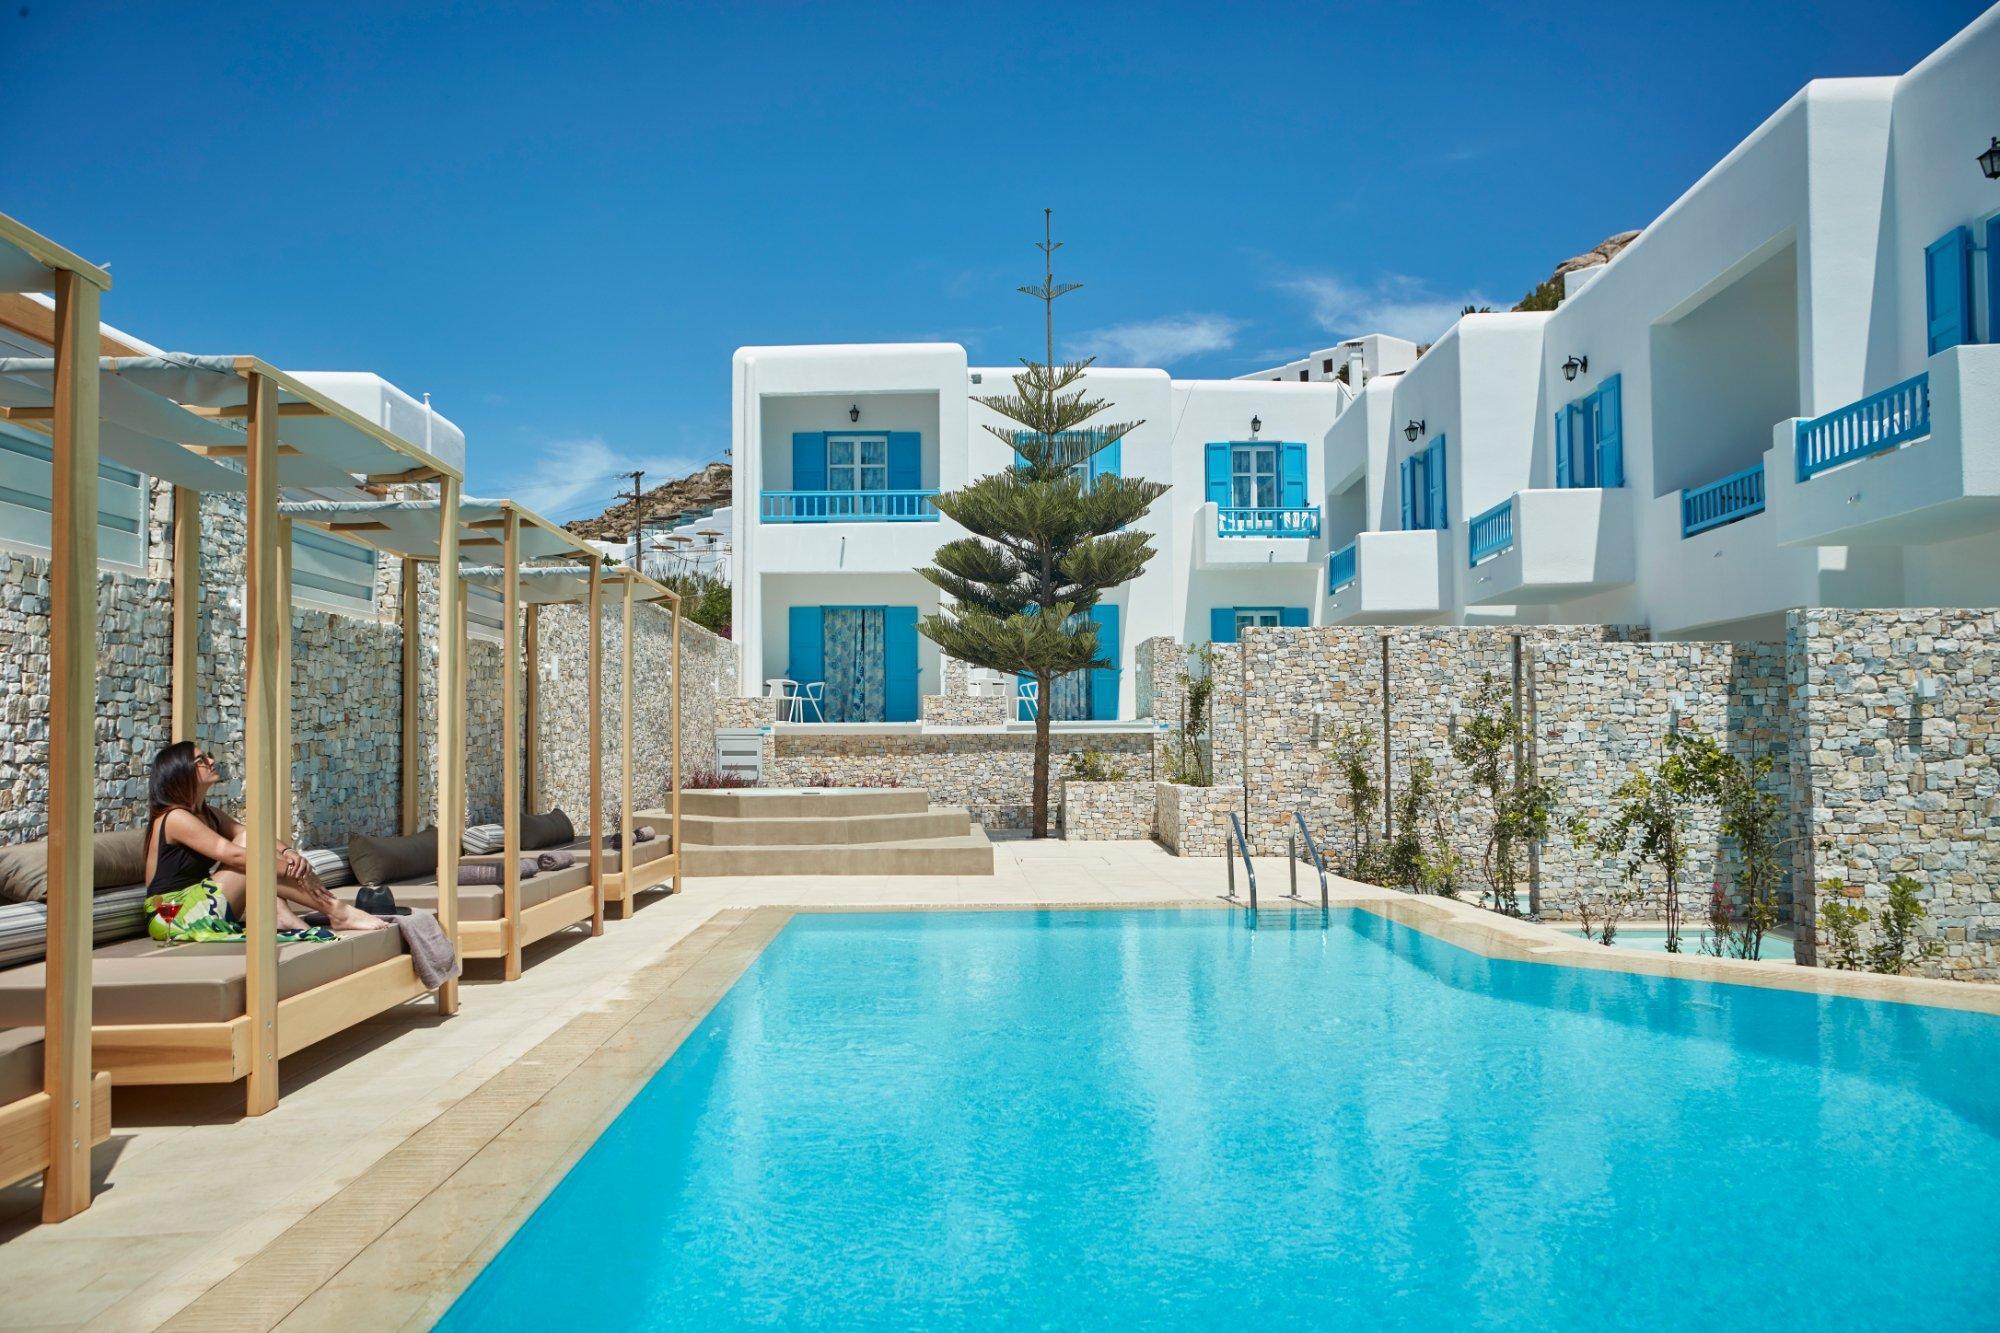 Фото Mykonos Kosmoplaz Beach Resort Hotel 4*